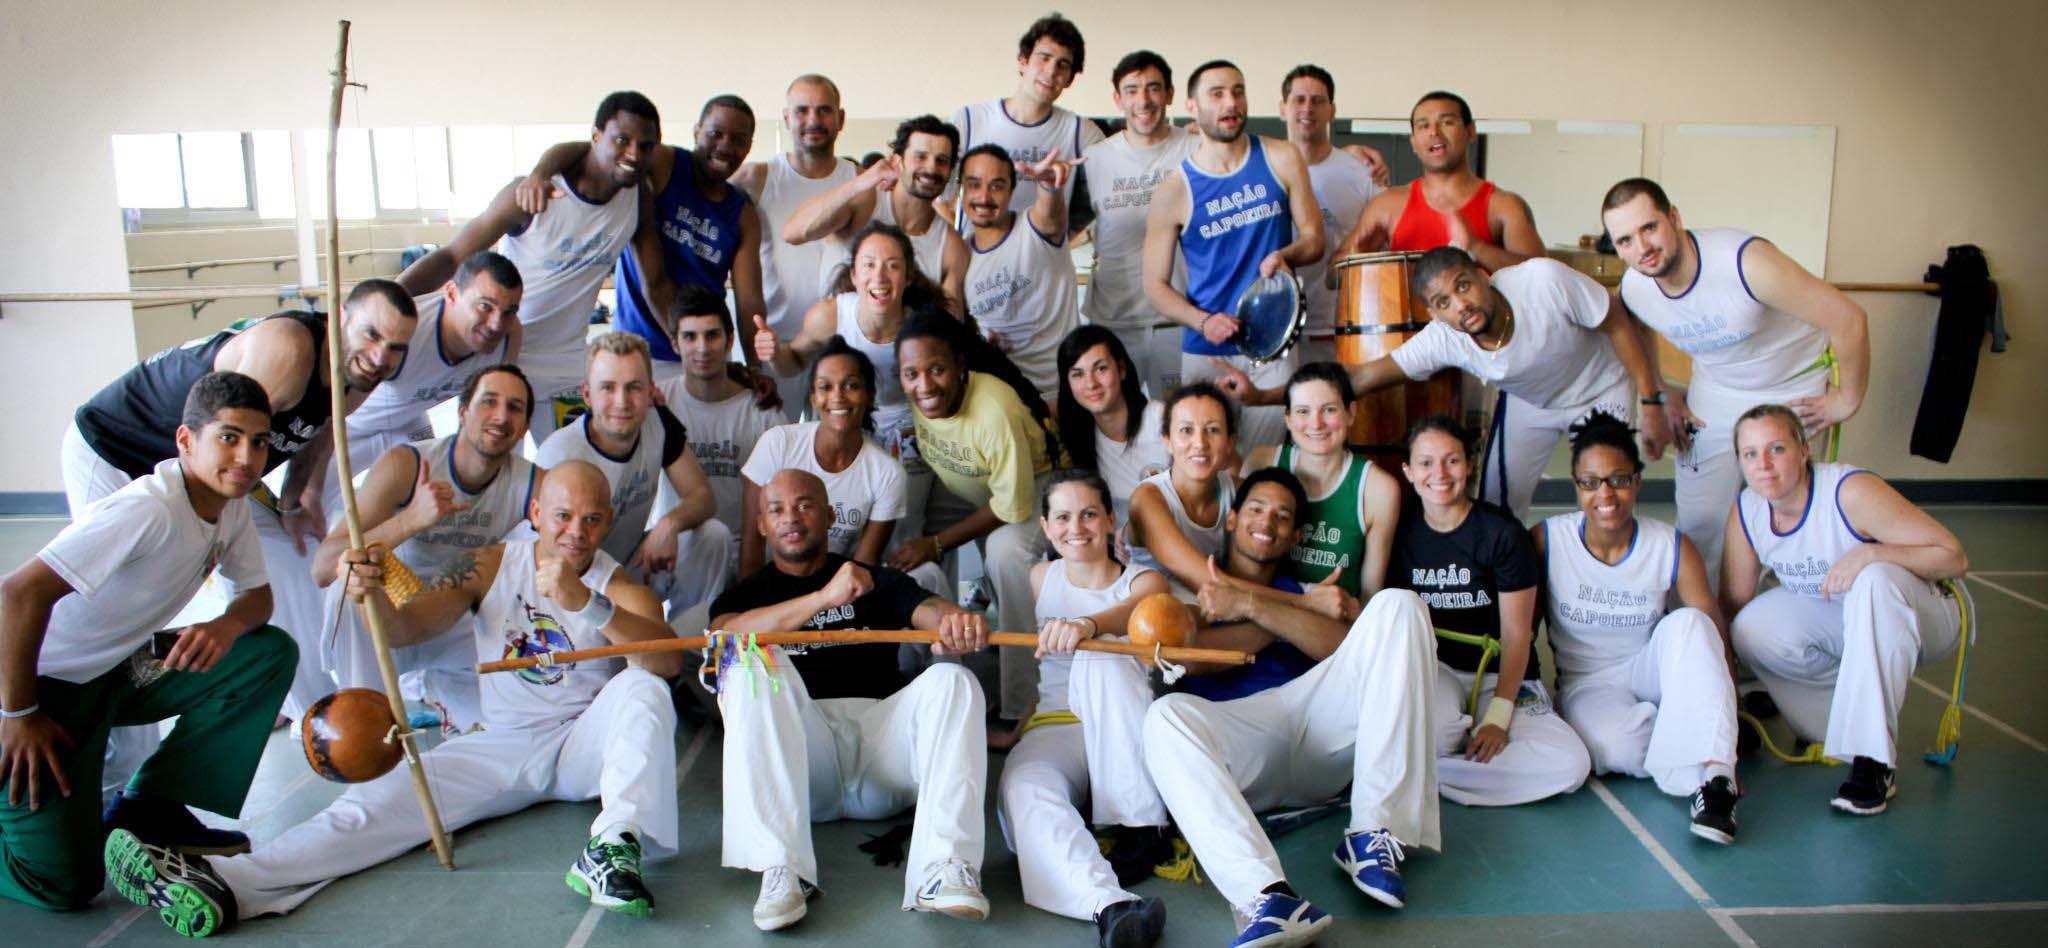 groupe_nacao_capoeira